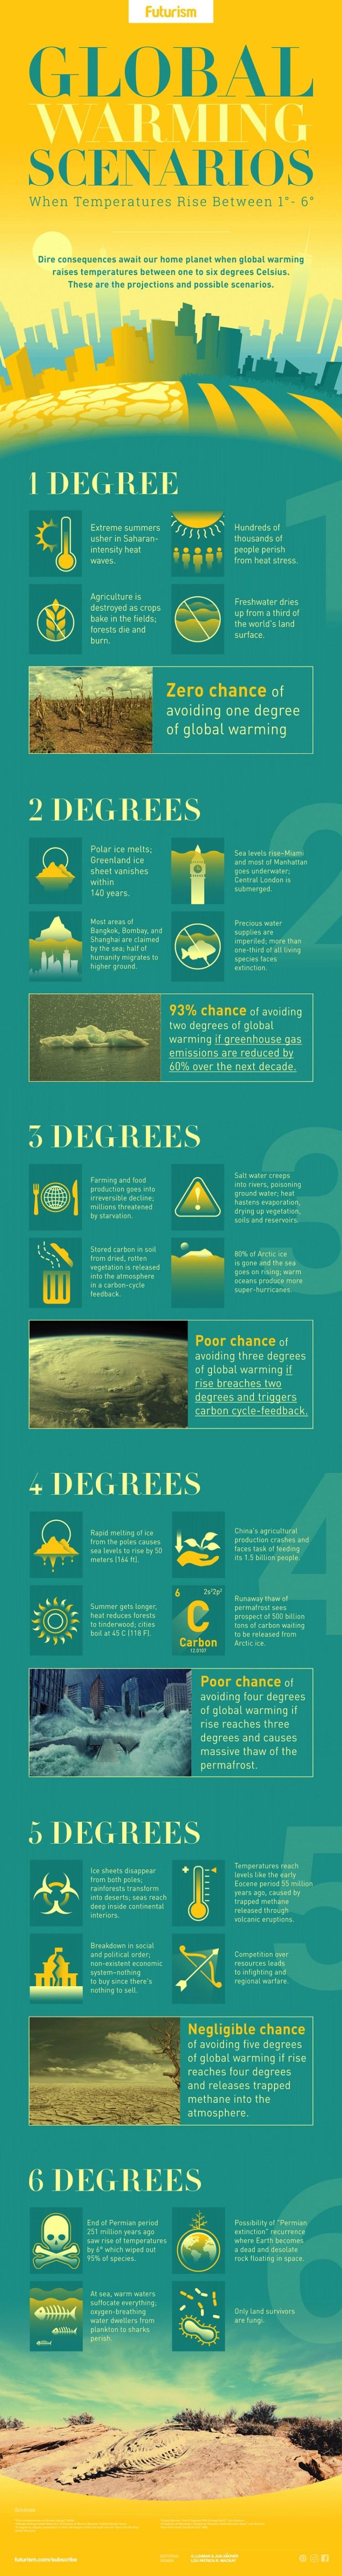 Global Warming Scenarios